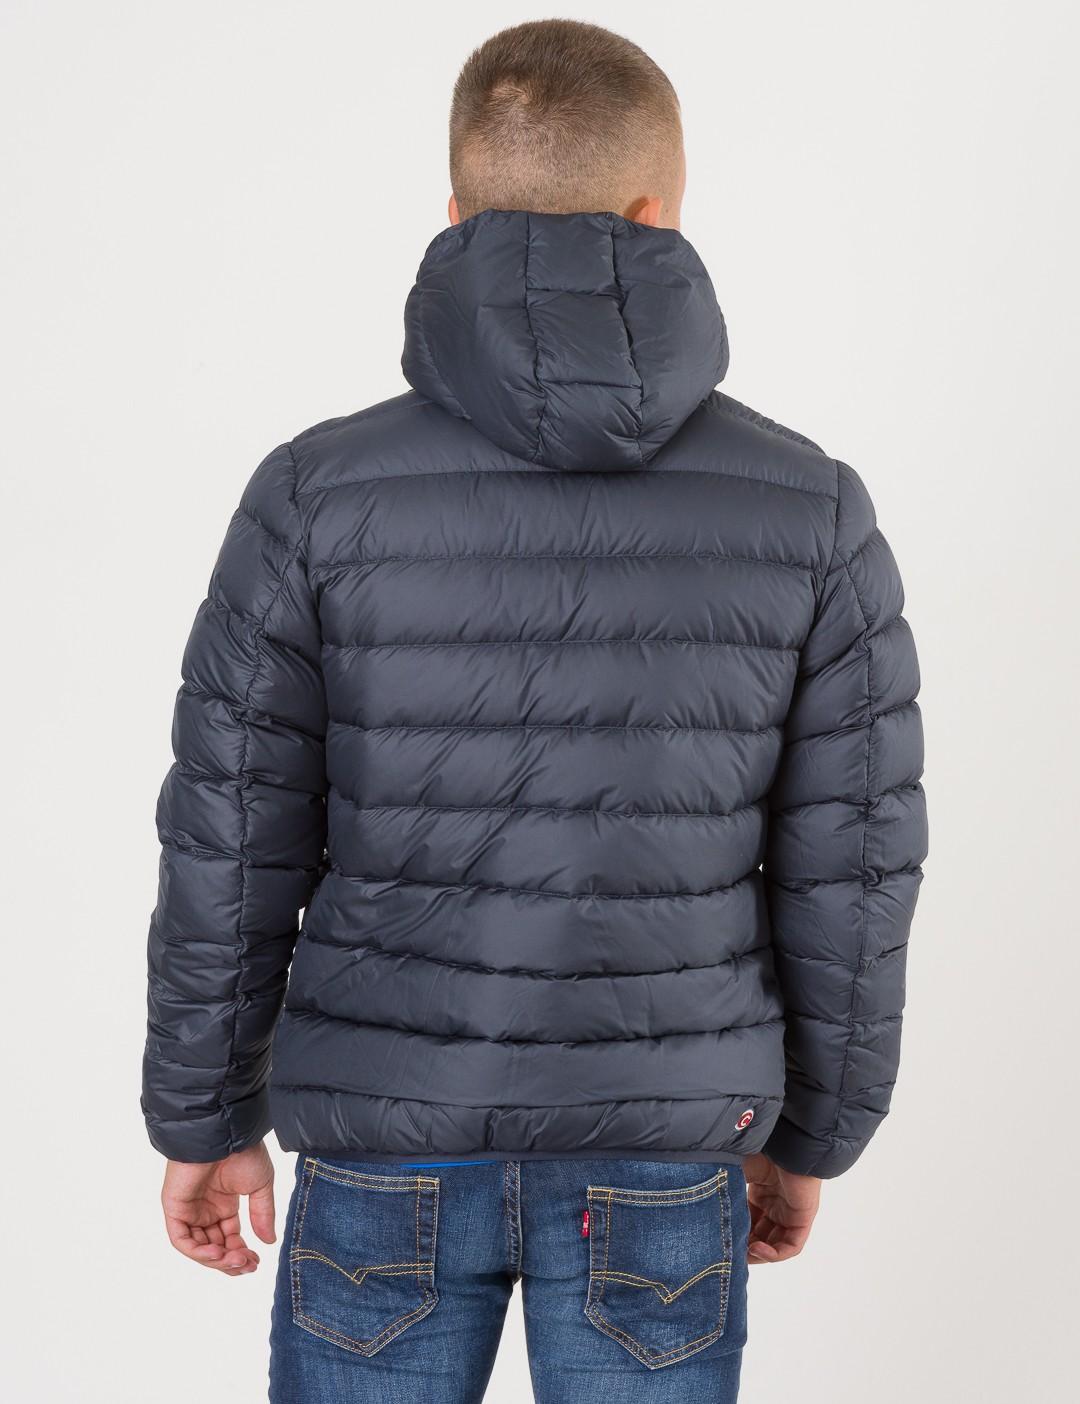 49da68b8 Om Hooded Down Jacket Ii - Blå från Colmar | KidsBrandStore